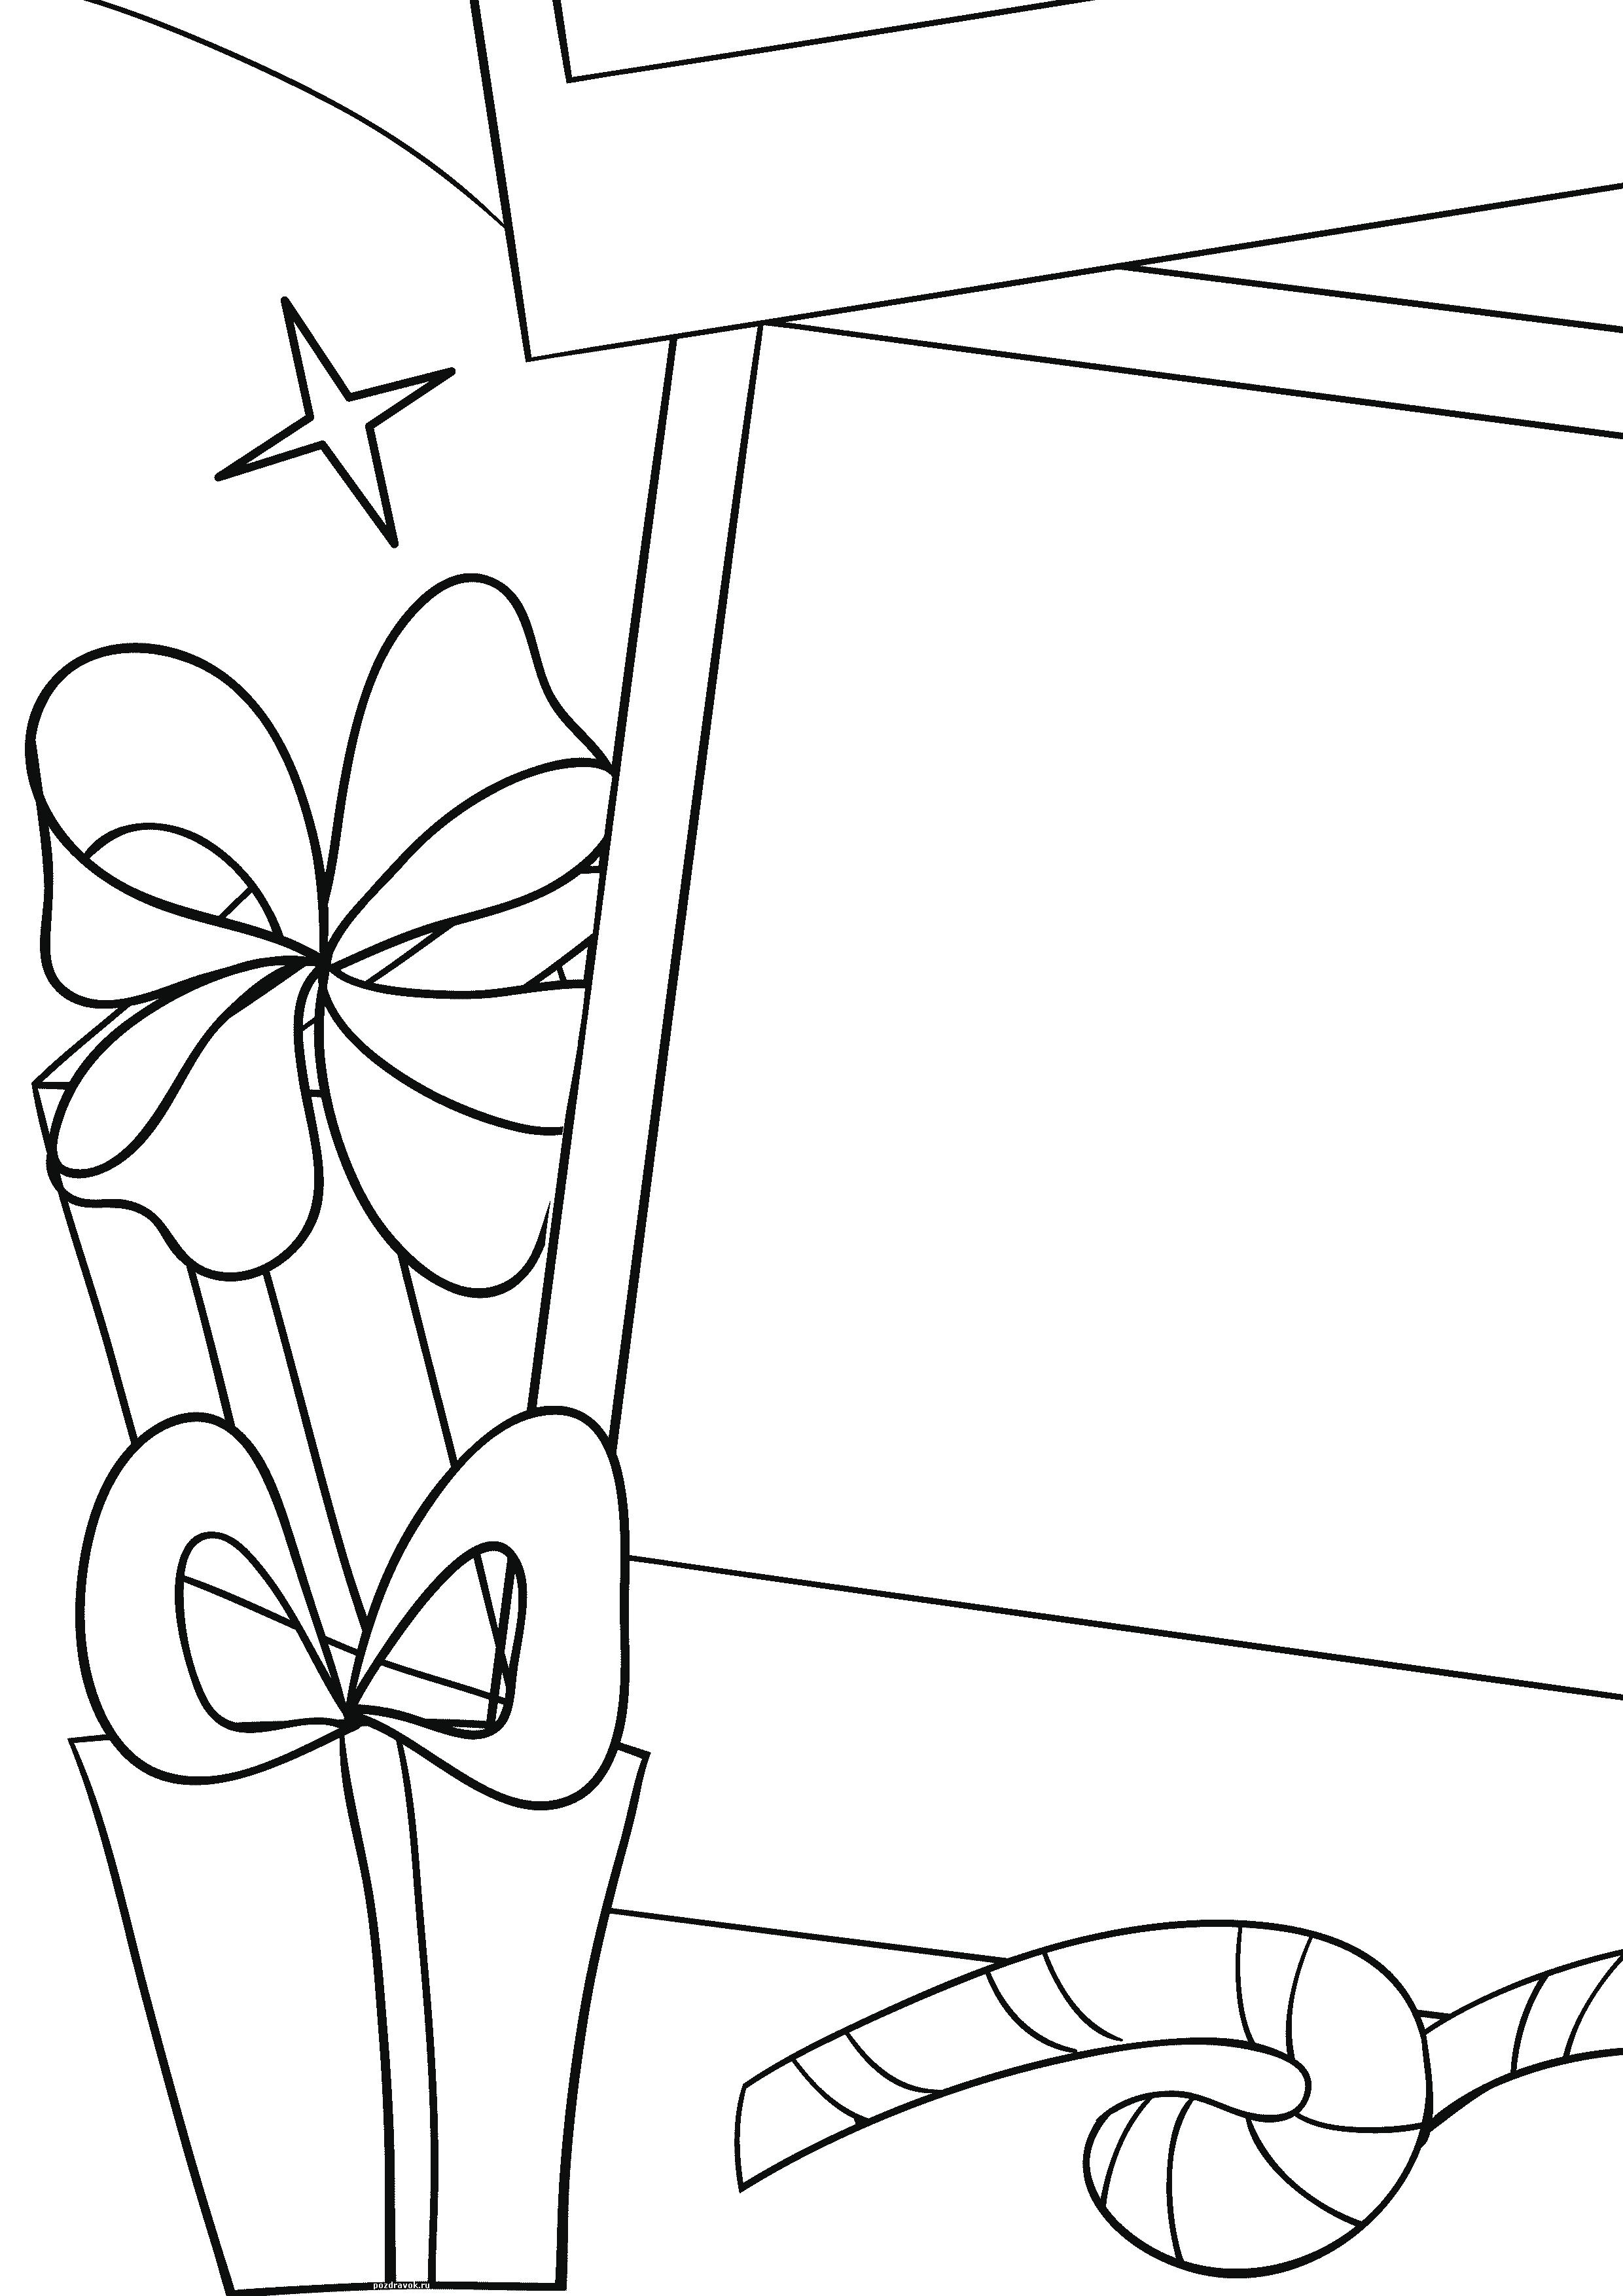 часть-5